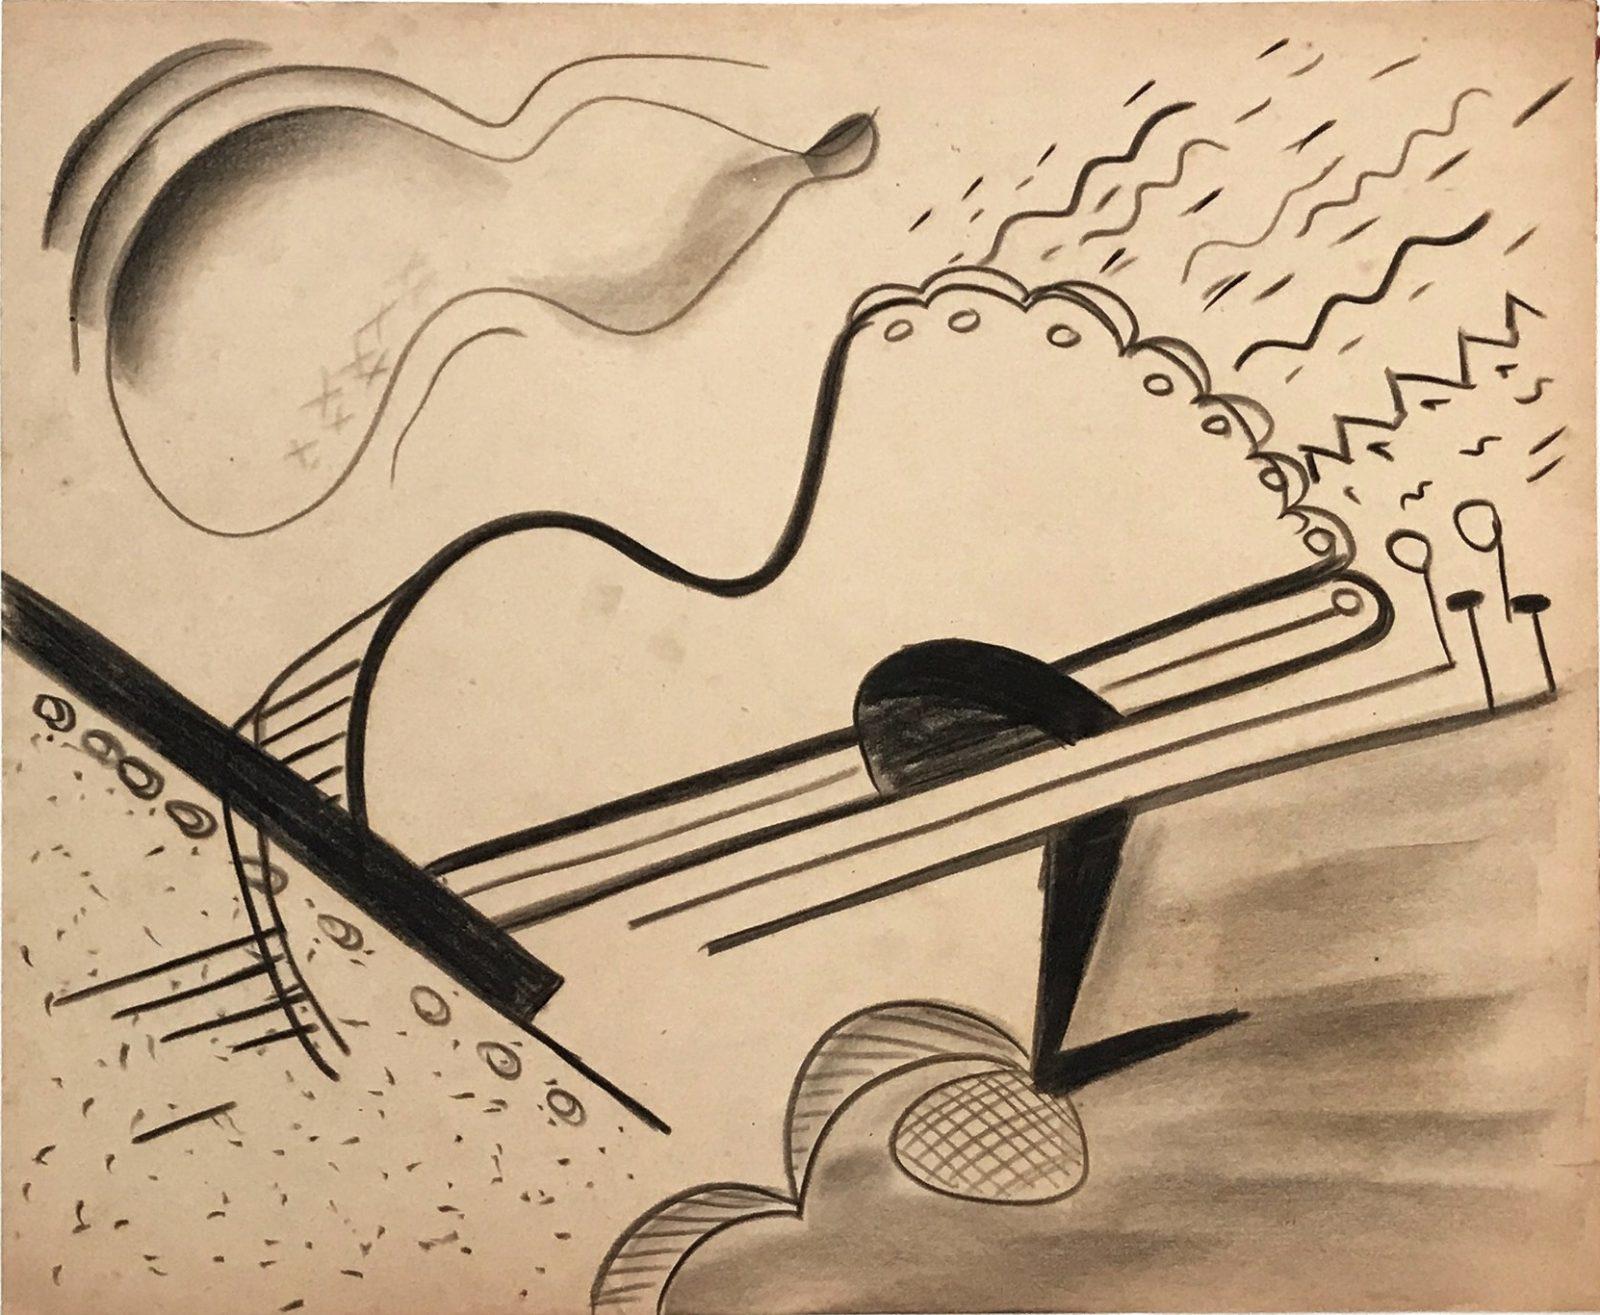 "Dusti Bongé, Untitled (SurrealistComposition with Cello),1945, charcoal onpaper, 14 "" x 16 3/4""."